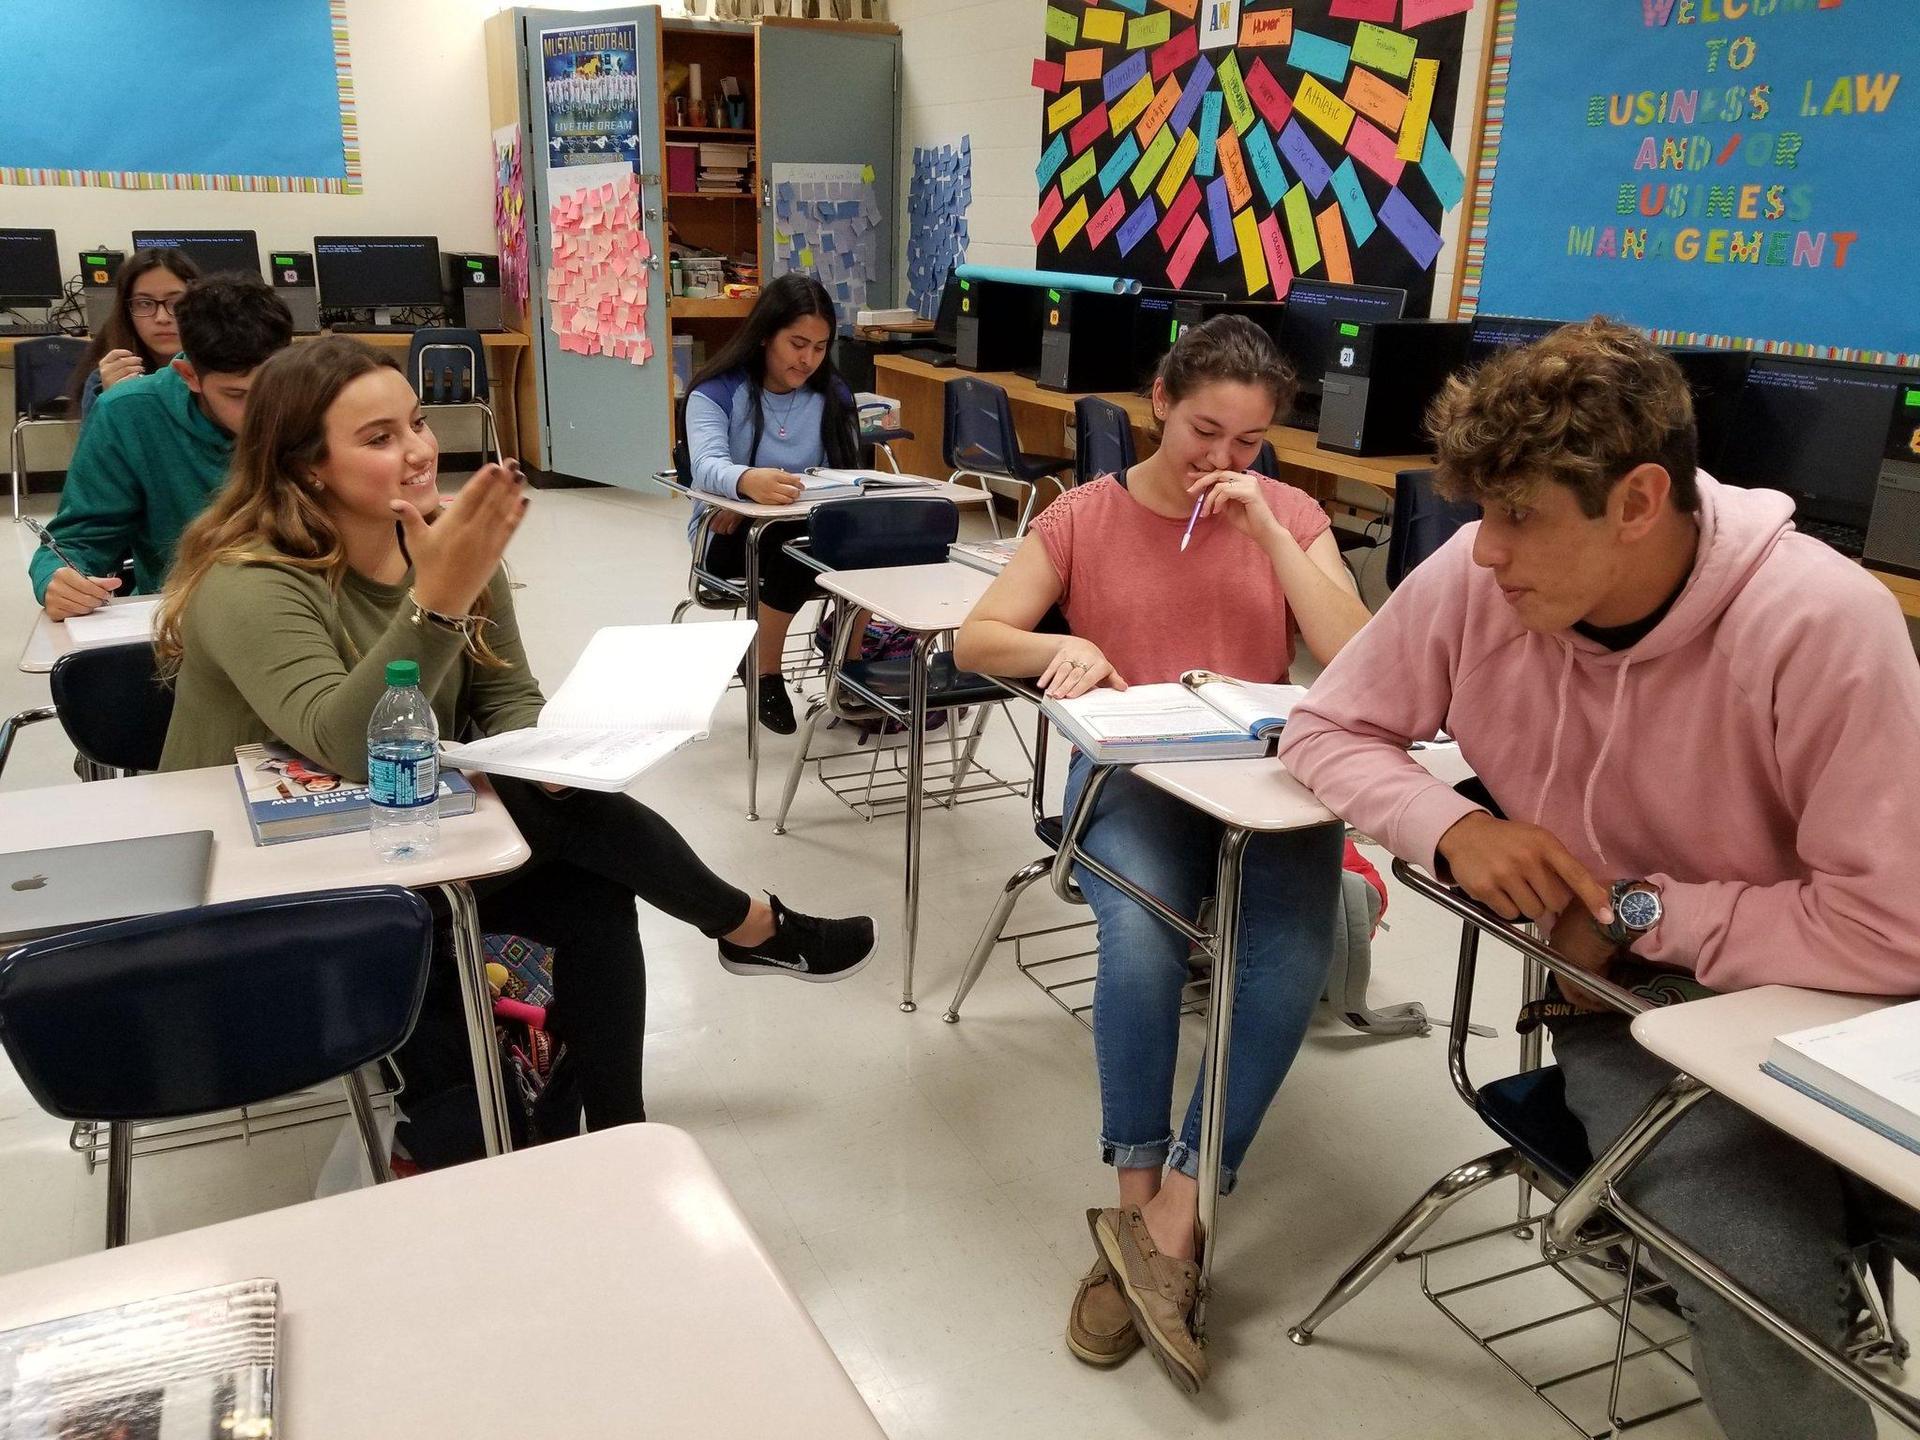 students sitting in desks conversing